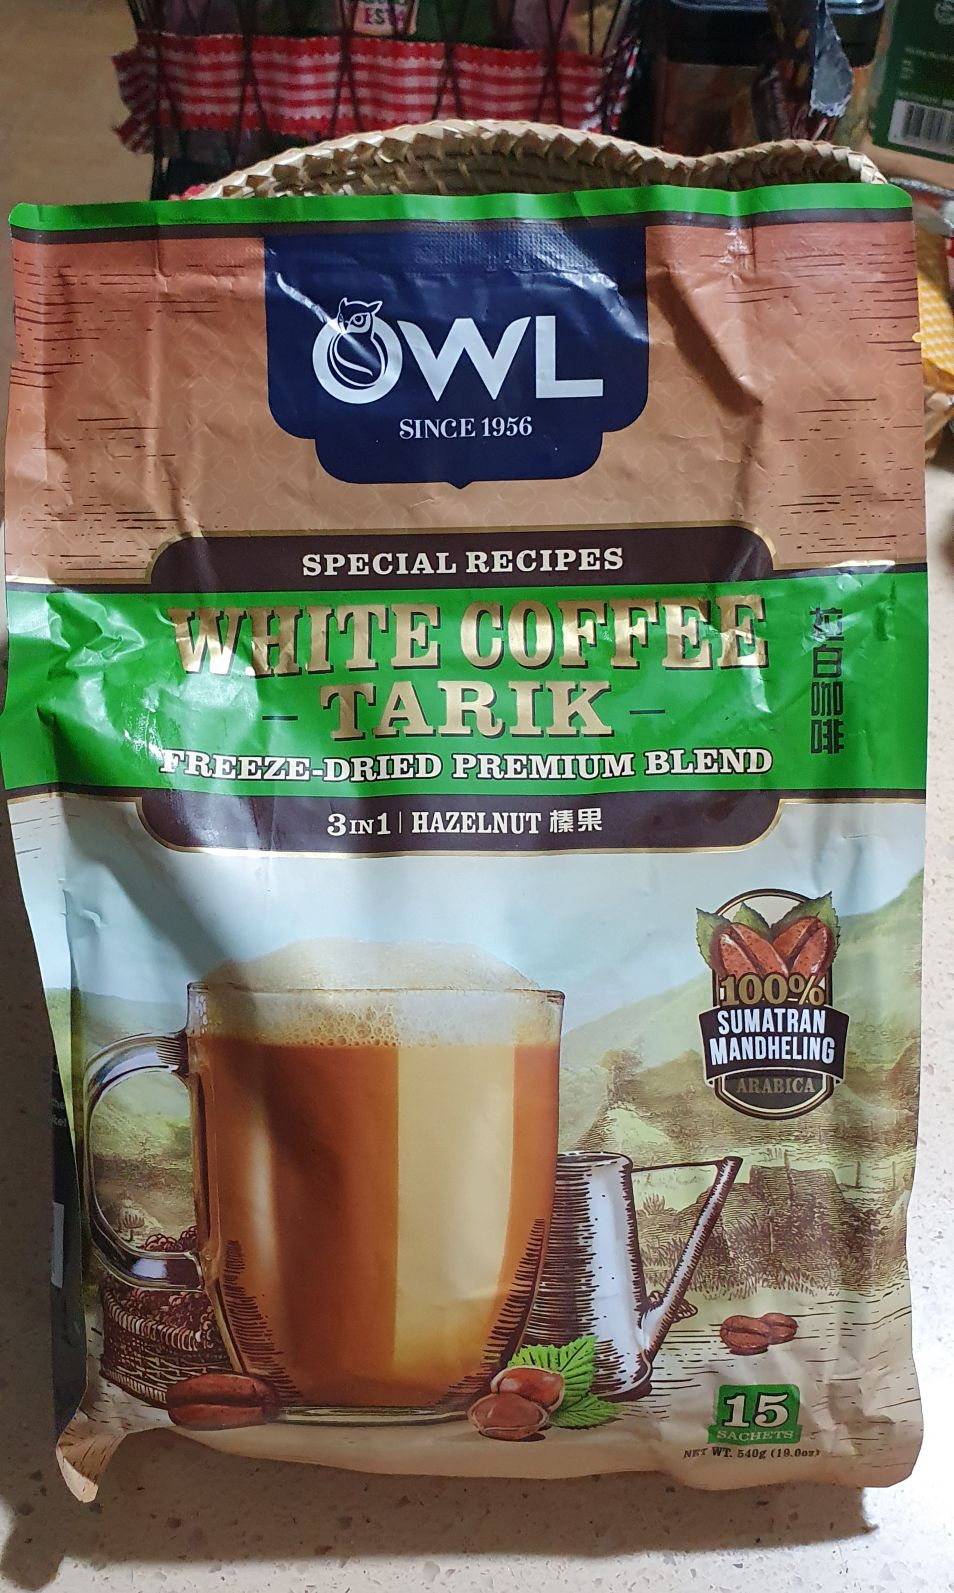 OWL WHITE COFFEE TARIK 3IN1 HAZELNUT | Shopee Philippines